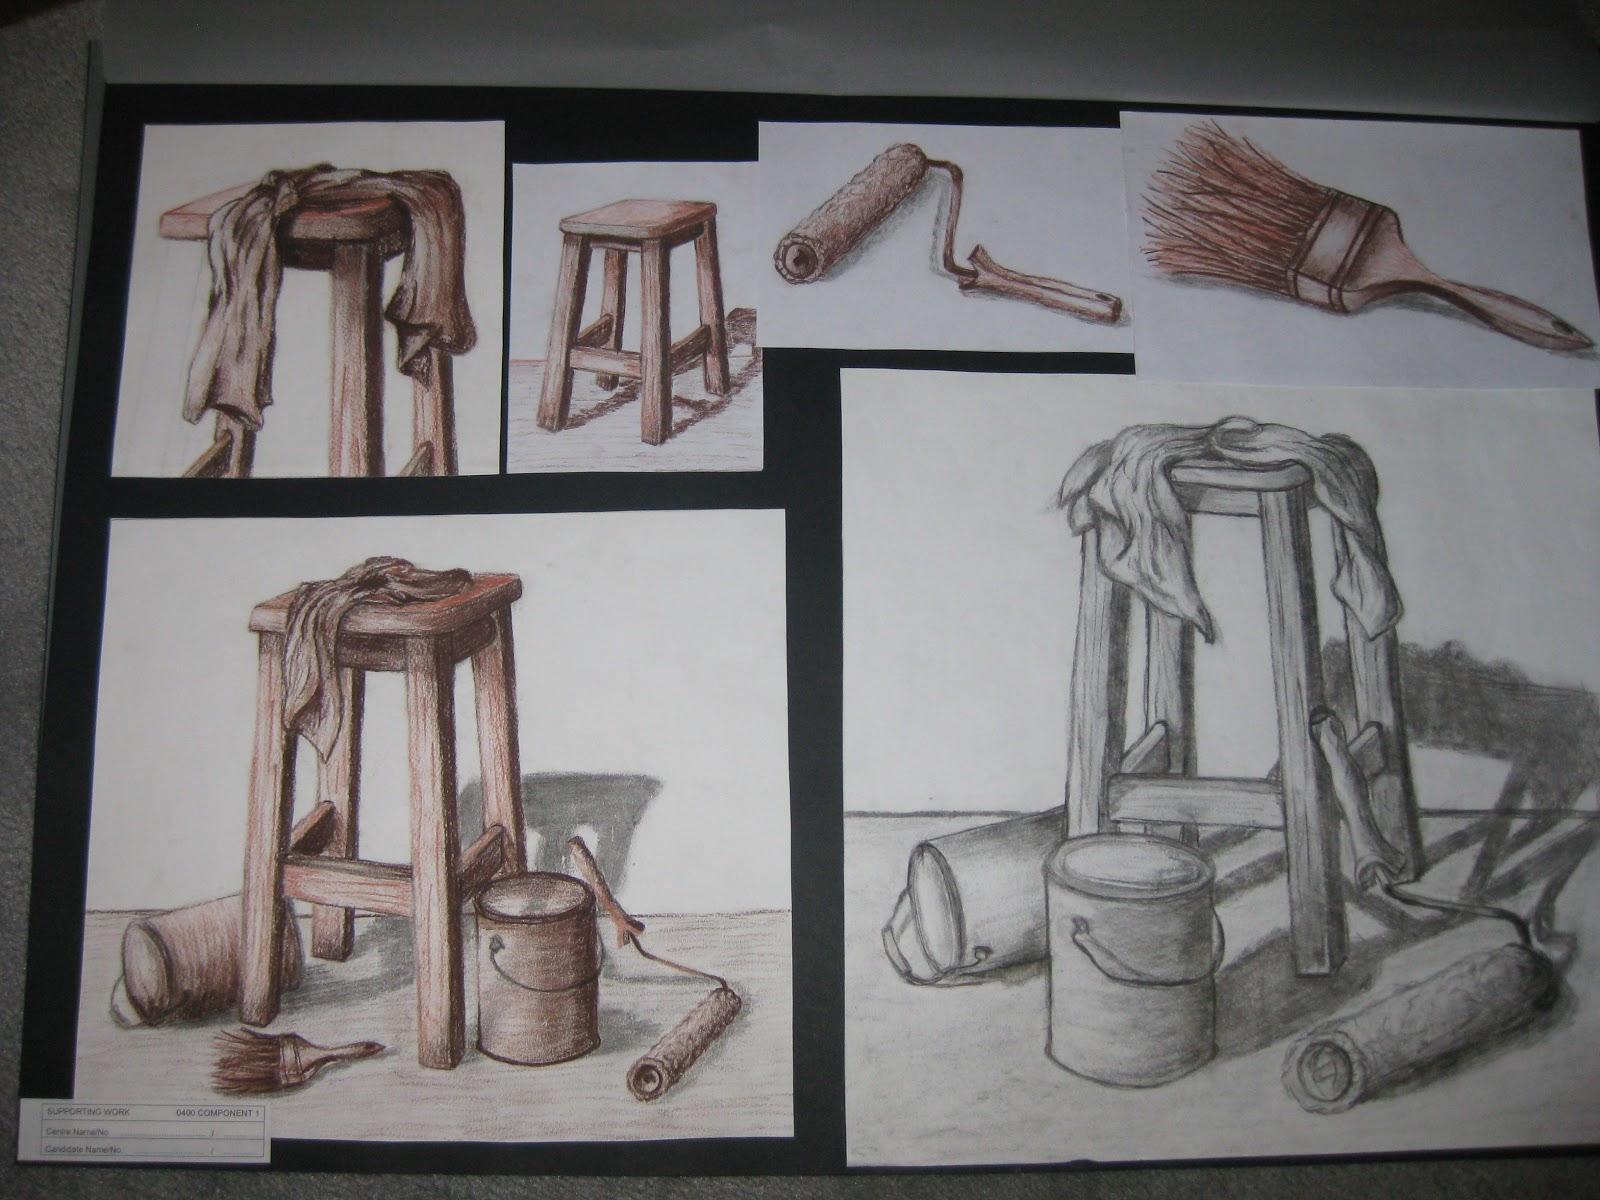 Flor Piacente: IGCSE Art